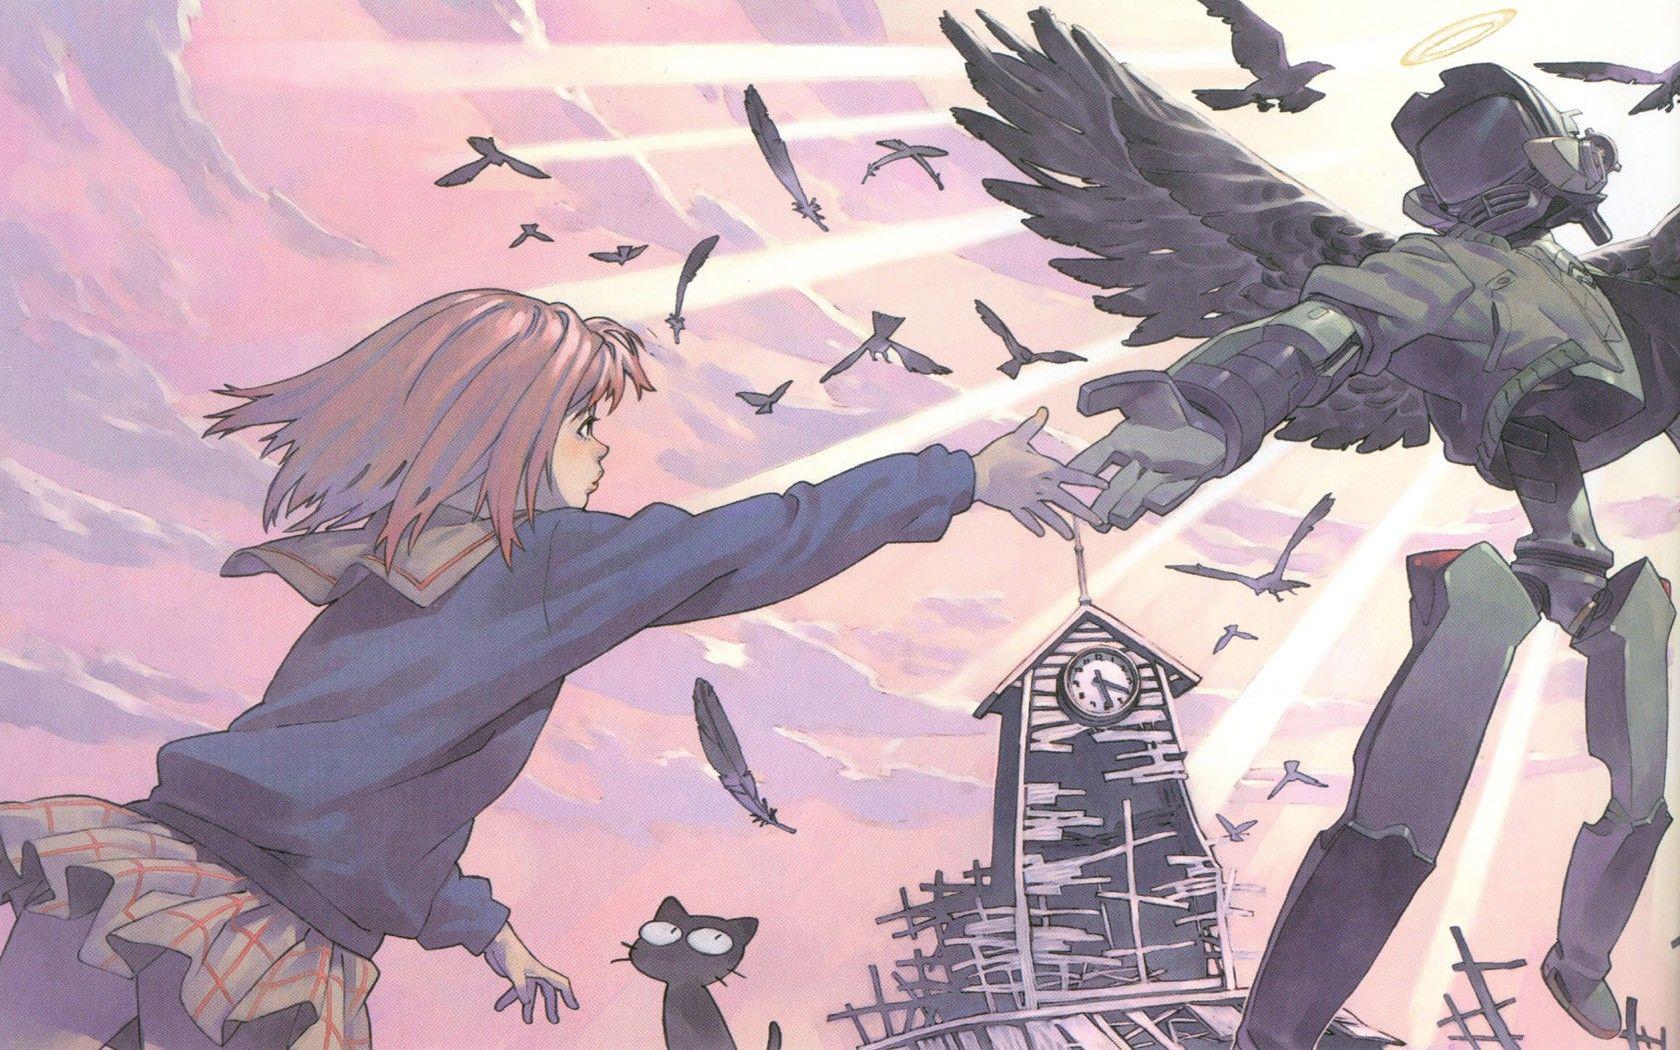 Anime 1680x1050 FLCL Flcl, Anime artwork, Anime